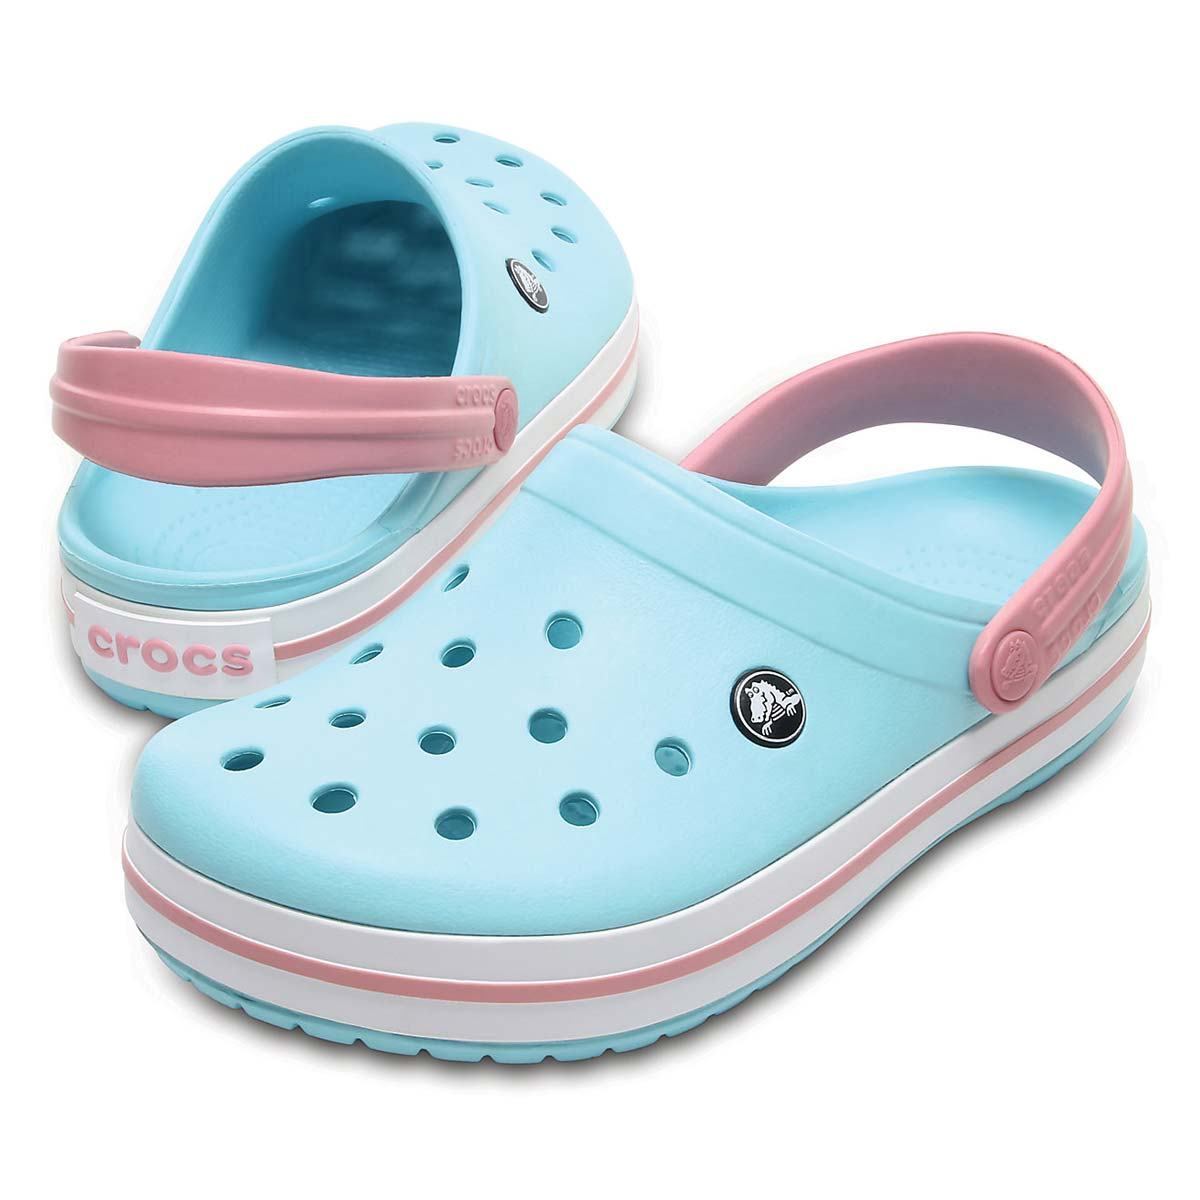 Crocs Blue Crocbandice Blue Crocs Crocbandice Blue Crocs Crocbandice Blue Crocs Crocbandice deCBrxoW